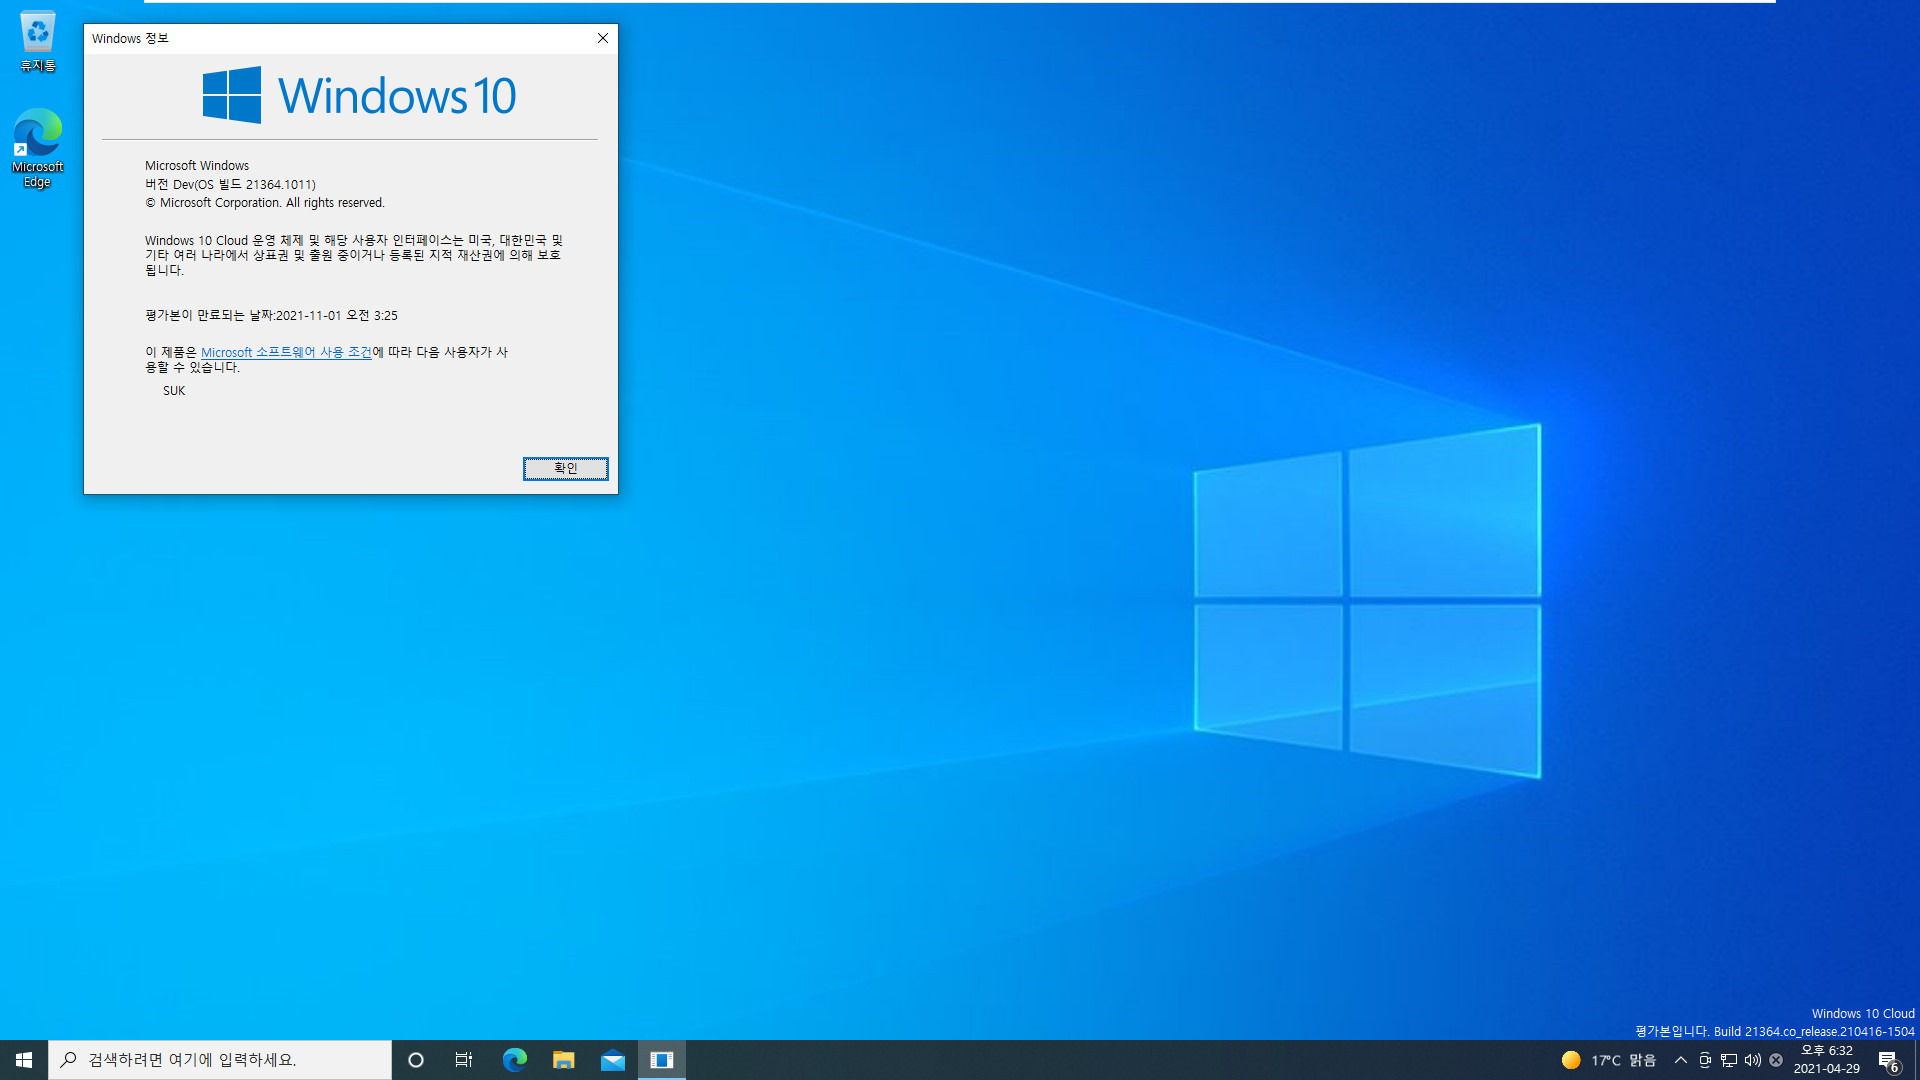 Windows 10 인사이더 프리뷰 버전 Dev (버전 21H2 예상) 21364 빌드에 Cloud Edition 설치 + Pro와 전환 테스트 = 잘 전환됩니다 2021-04-29_183257.jpg